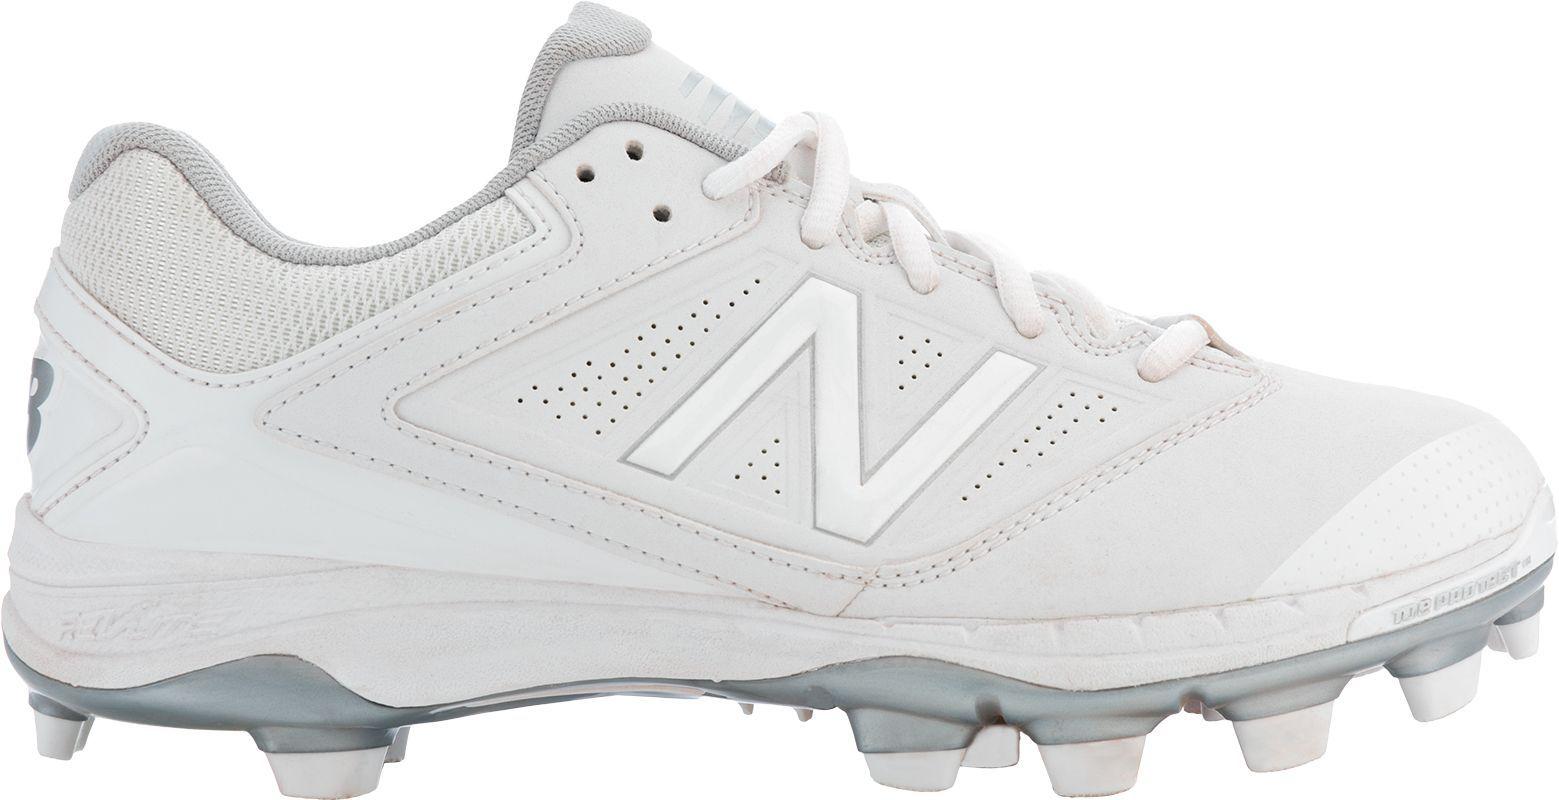 New Balance Women S 4040 V1 Tpu Fastpitch Softball Cleats